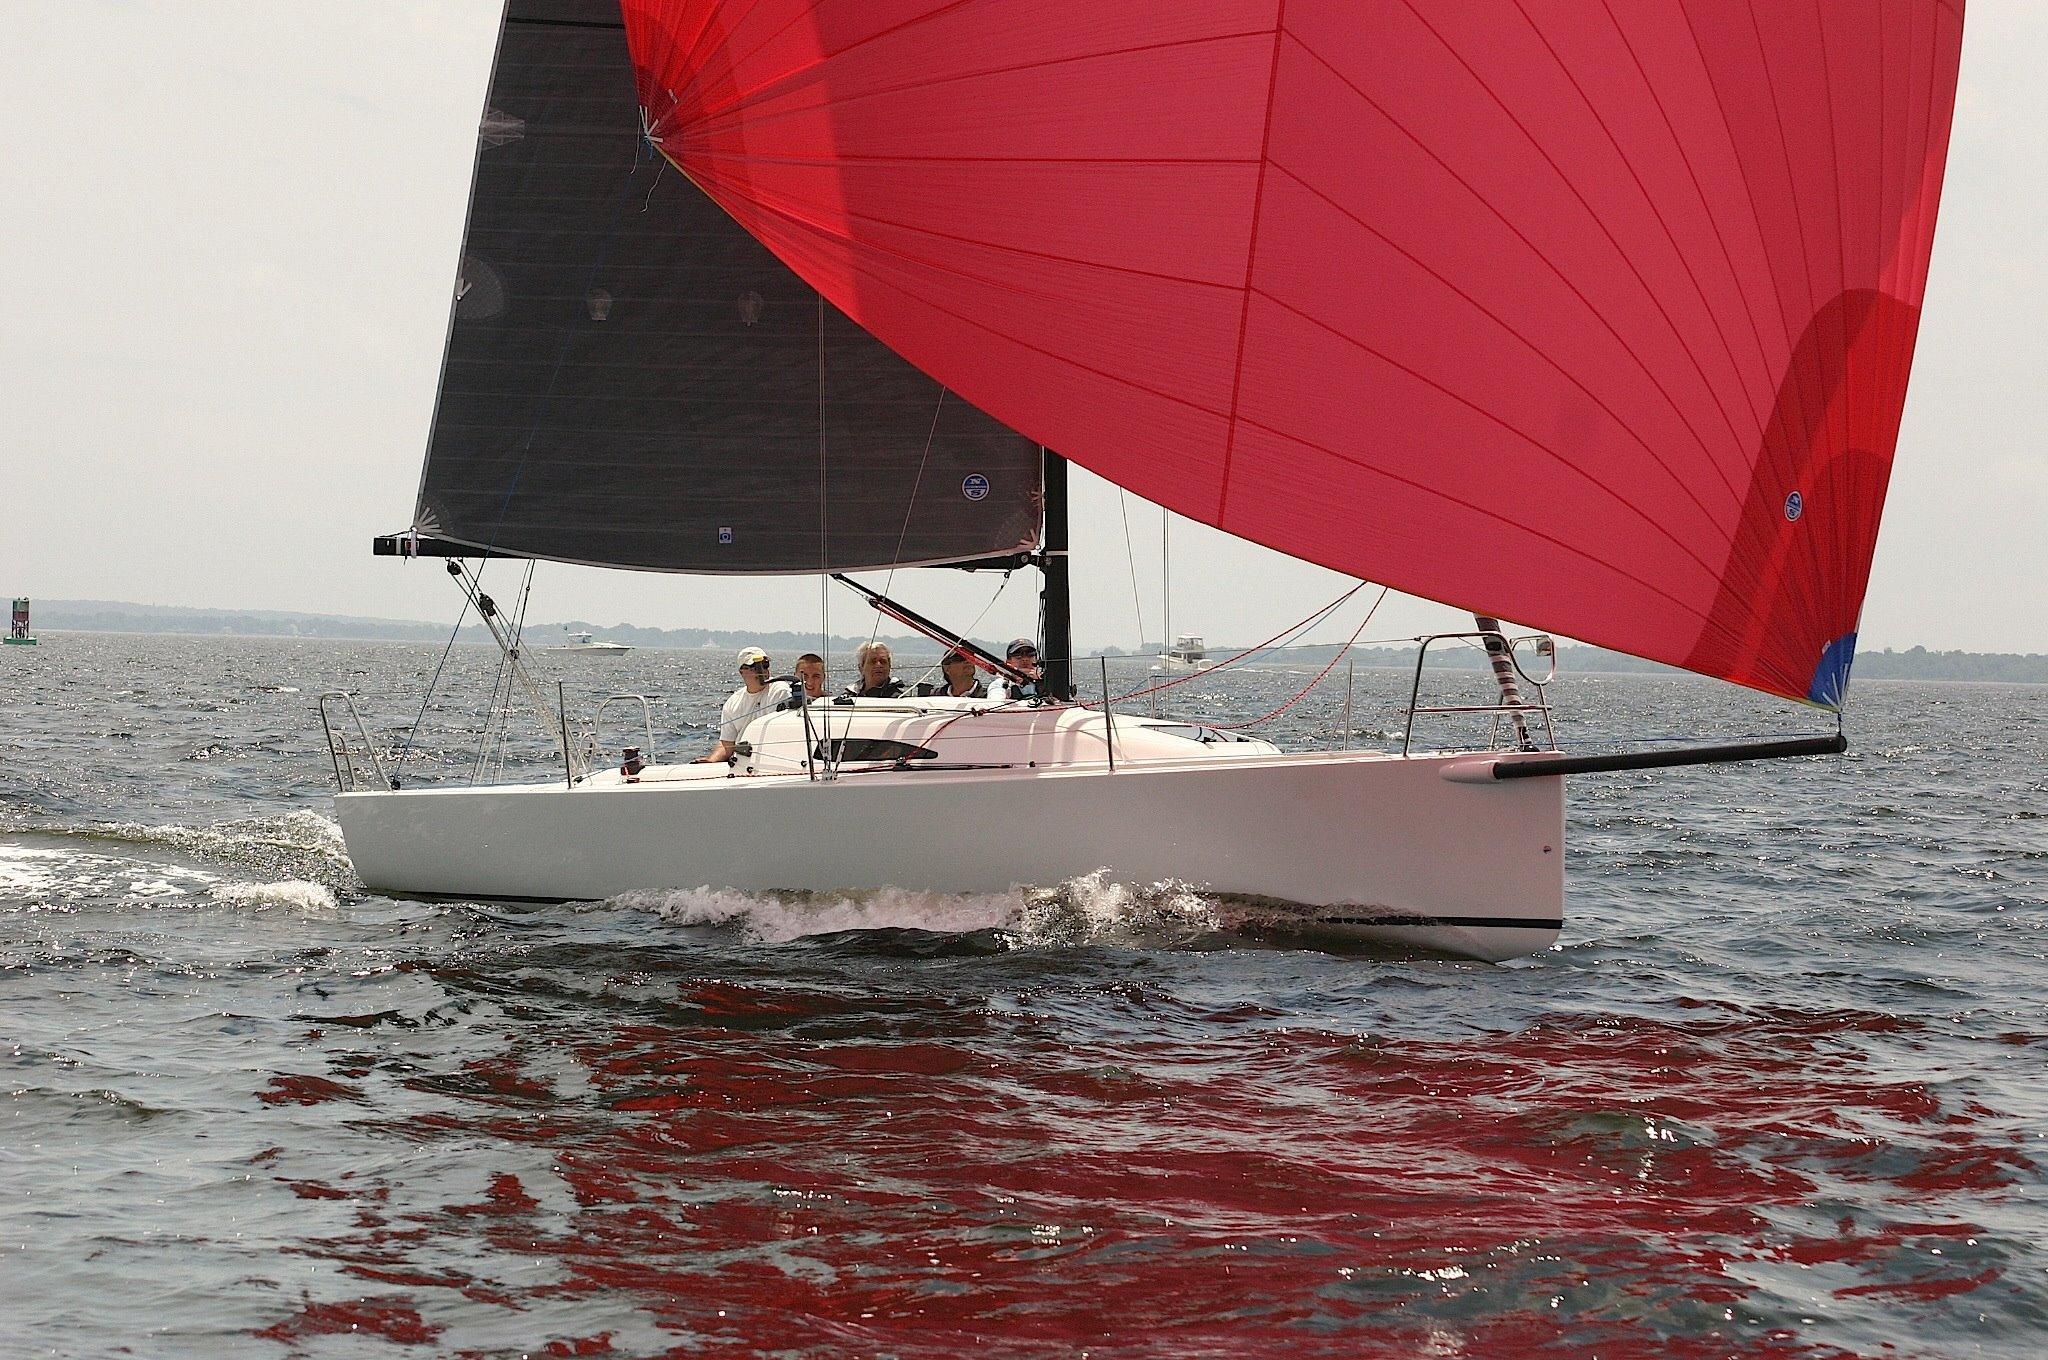 Stonington (CT) United States  city photos gallery : 2014 J Boats, J/88, J 88, J 88 J/88 Sail Boat For Sale